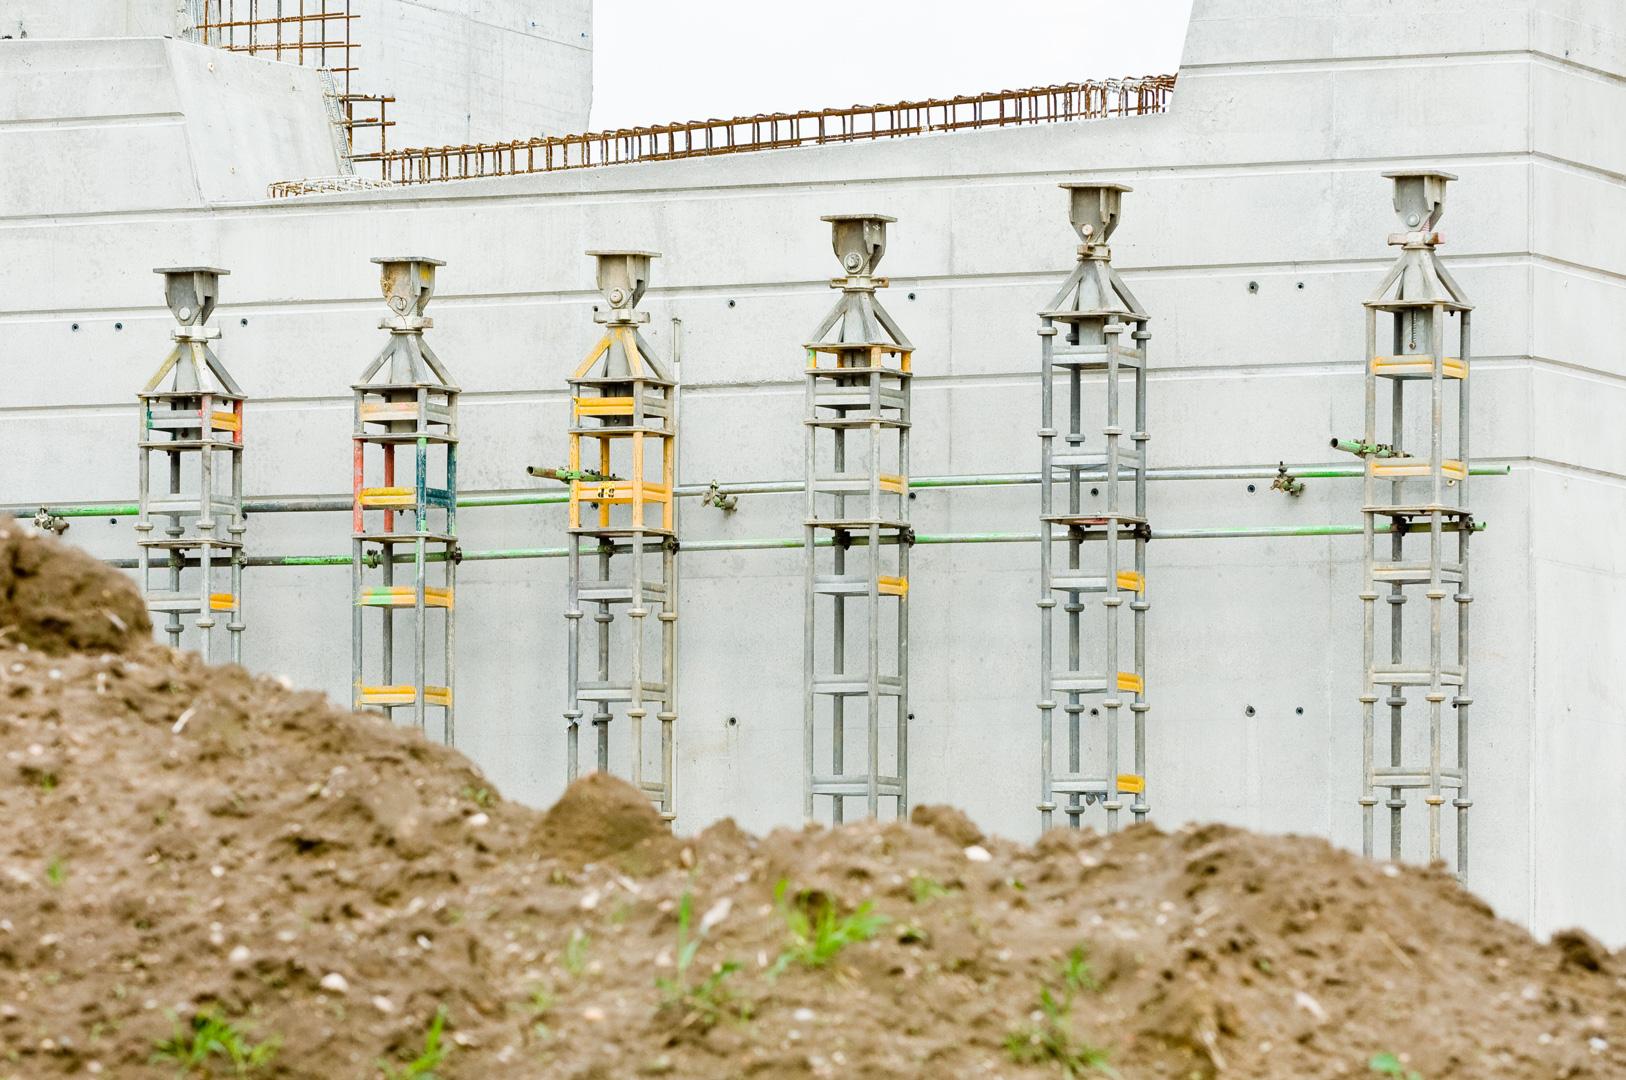 Bridge construction site at Schönefeld Airport Berlin